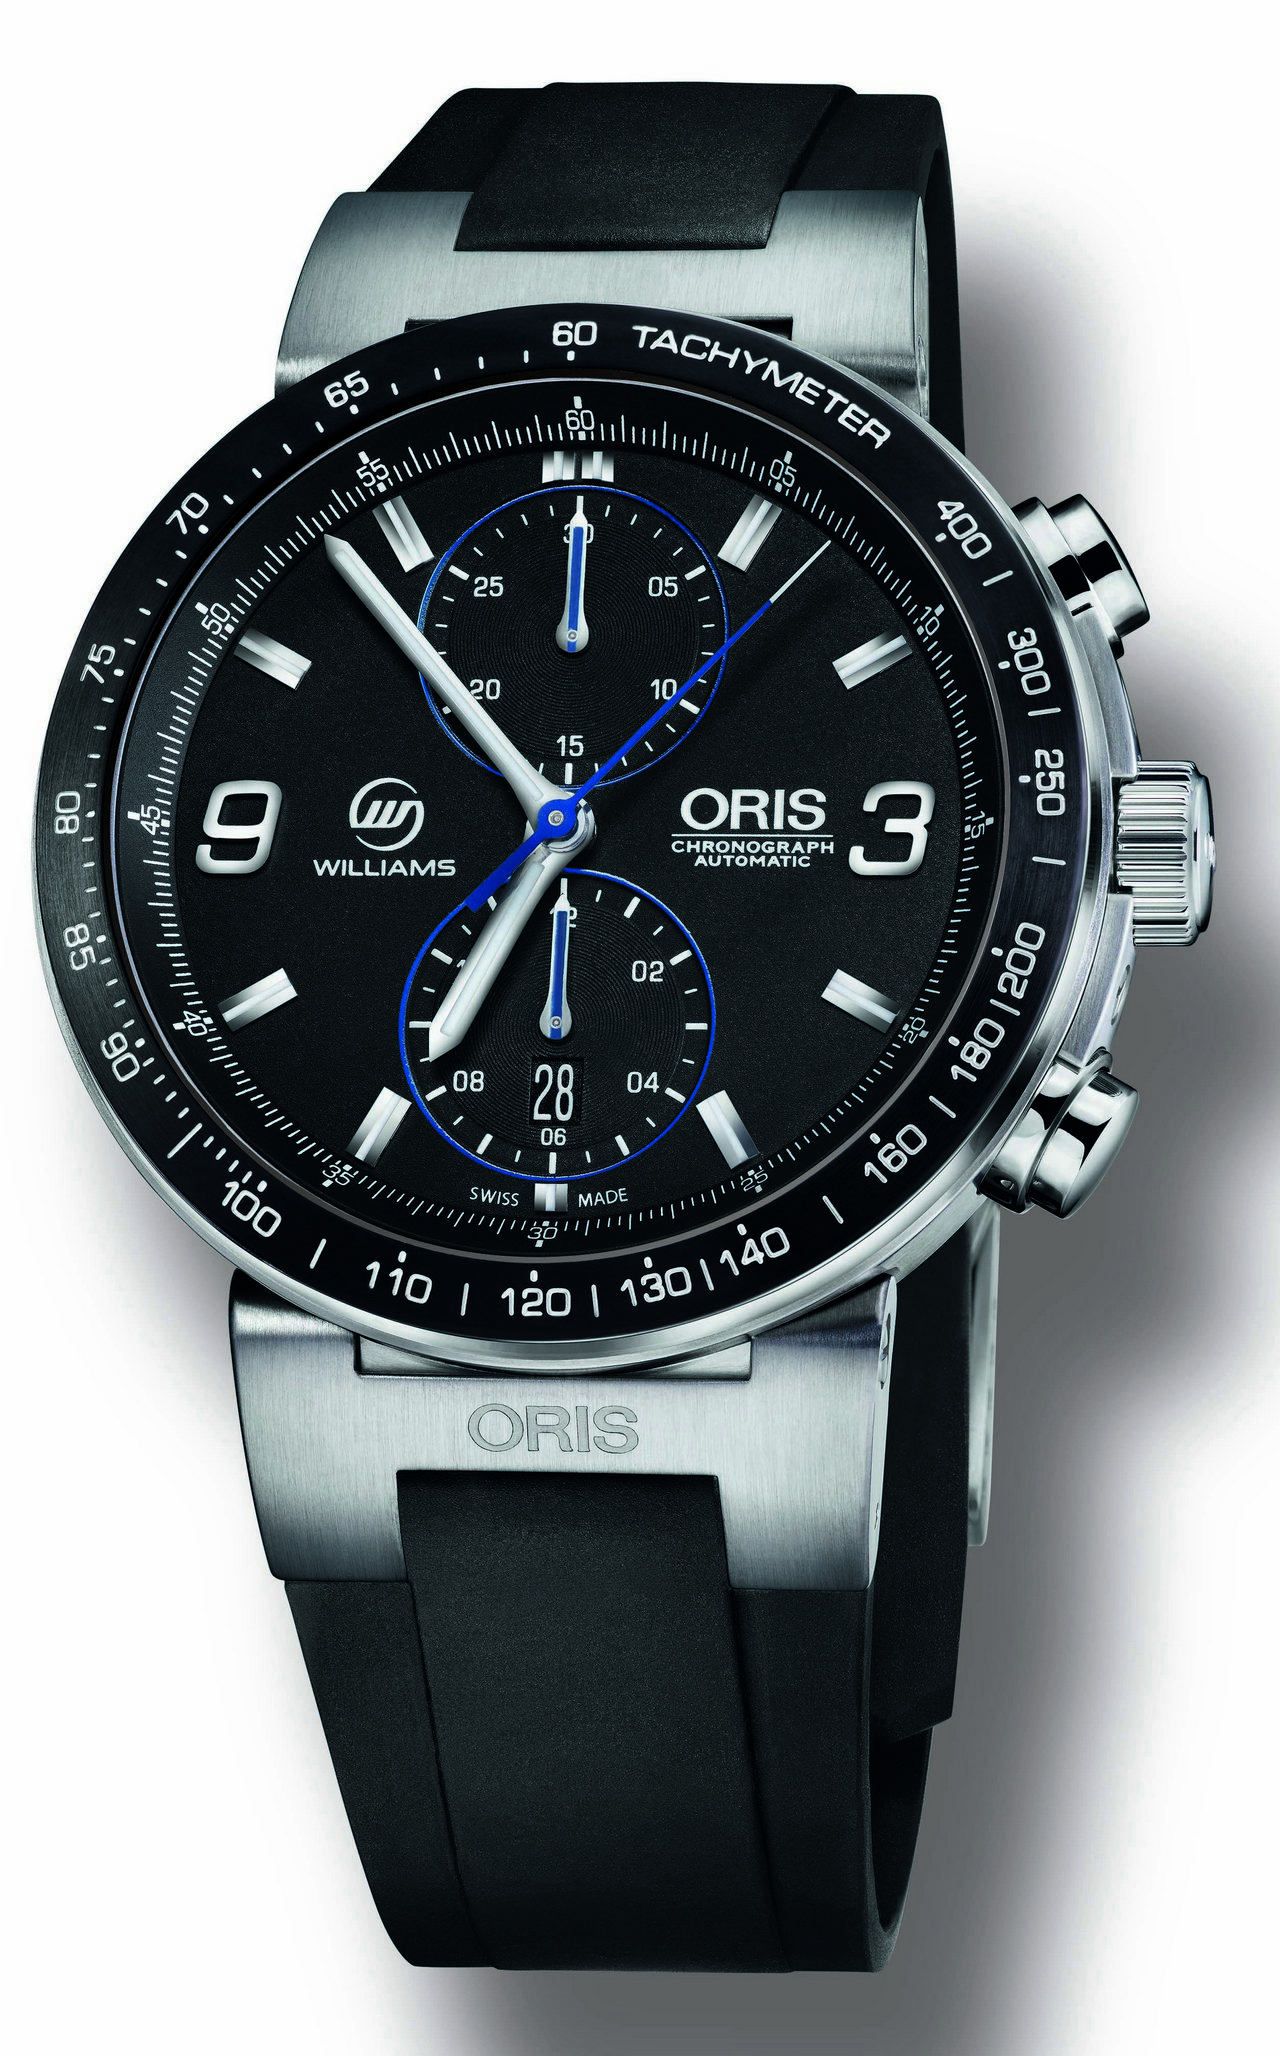 oris-williams-f1-team-600th-race-limited-edition_0-100_1